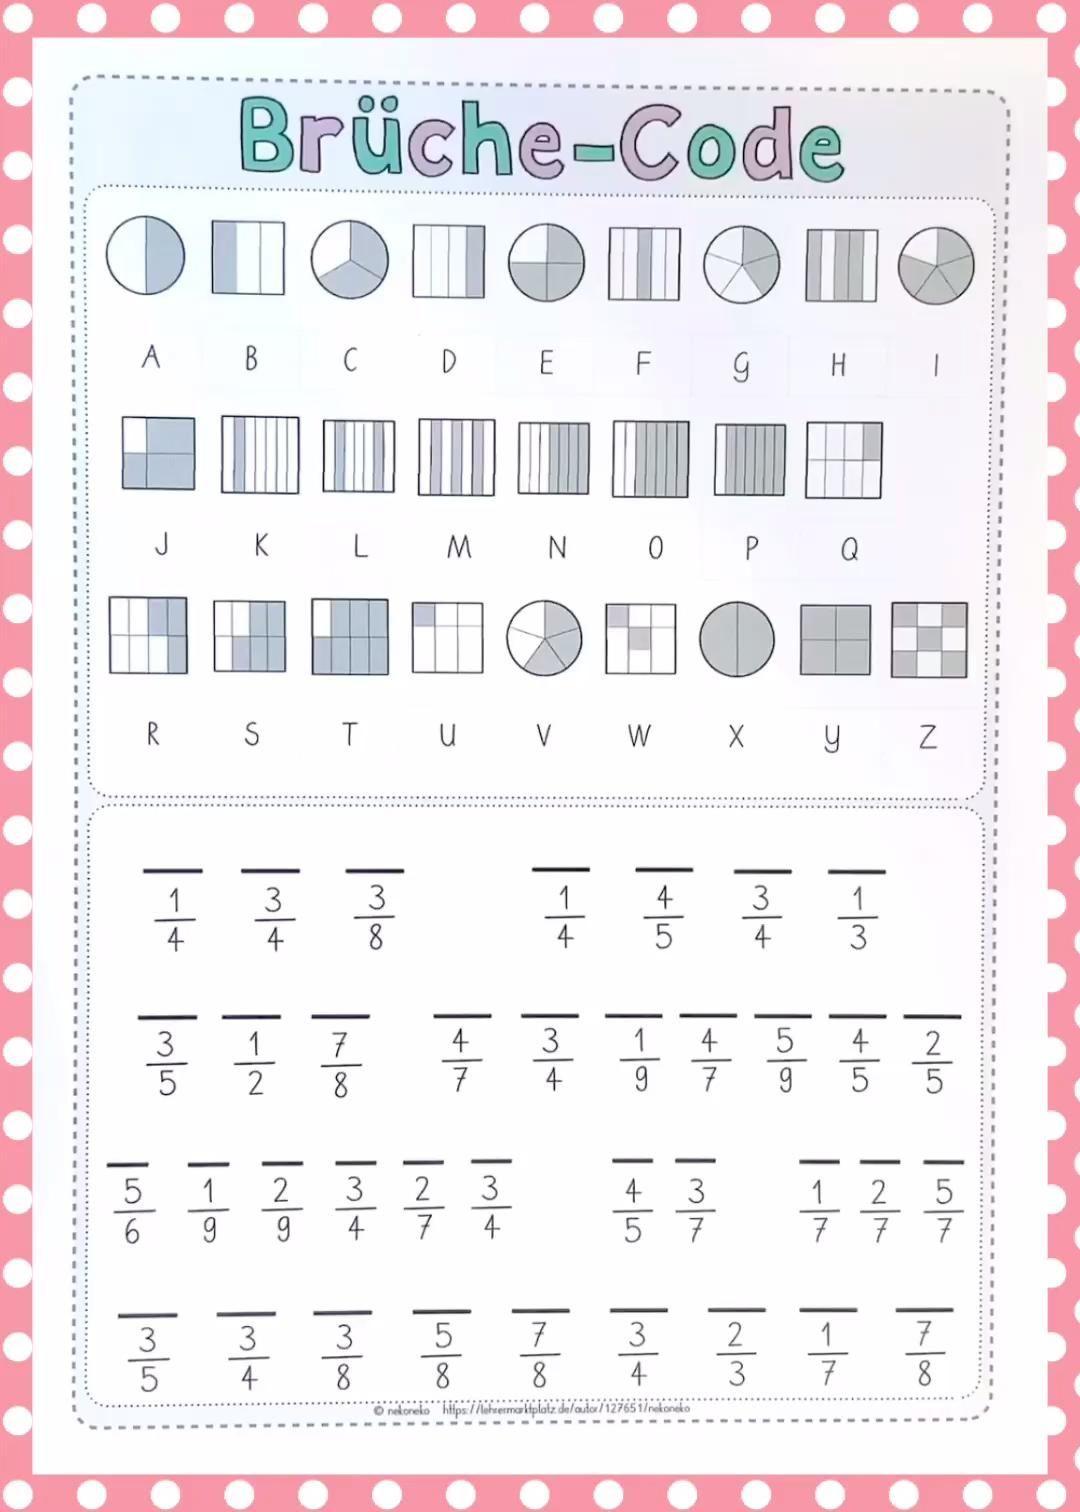 small resolution of Bruchrechnen   Knacke den Brüche-Code   Division#brüchecode #bruchrechnen  #den #division #knacke   Math worksheets